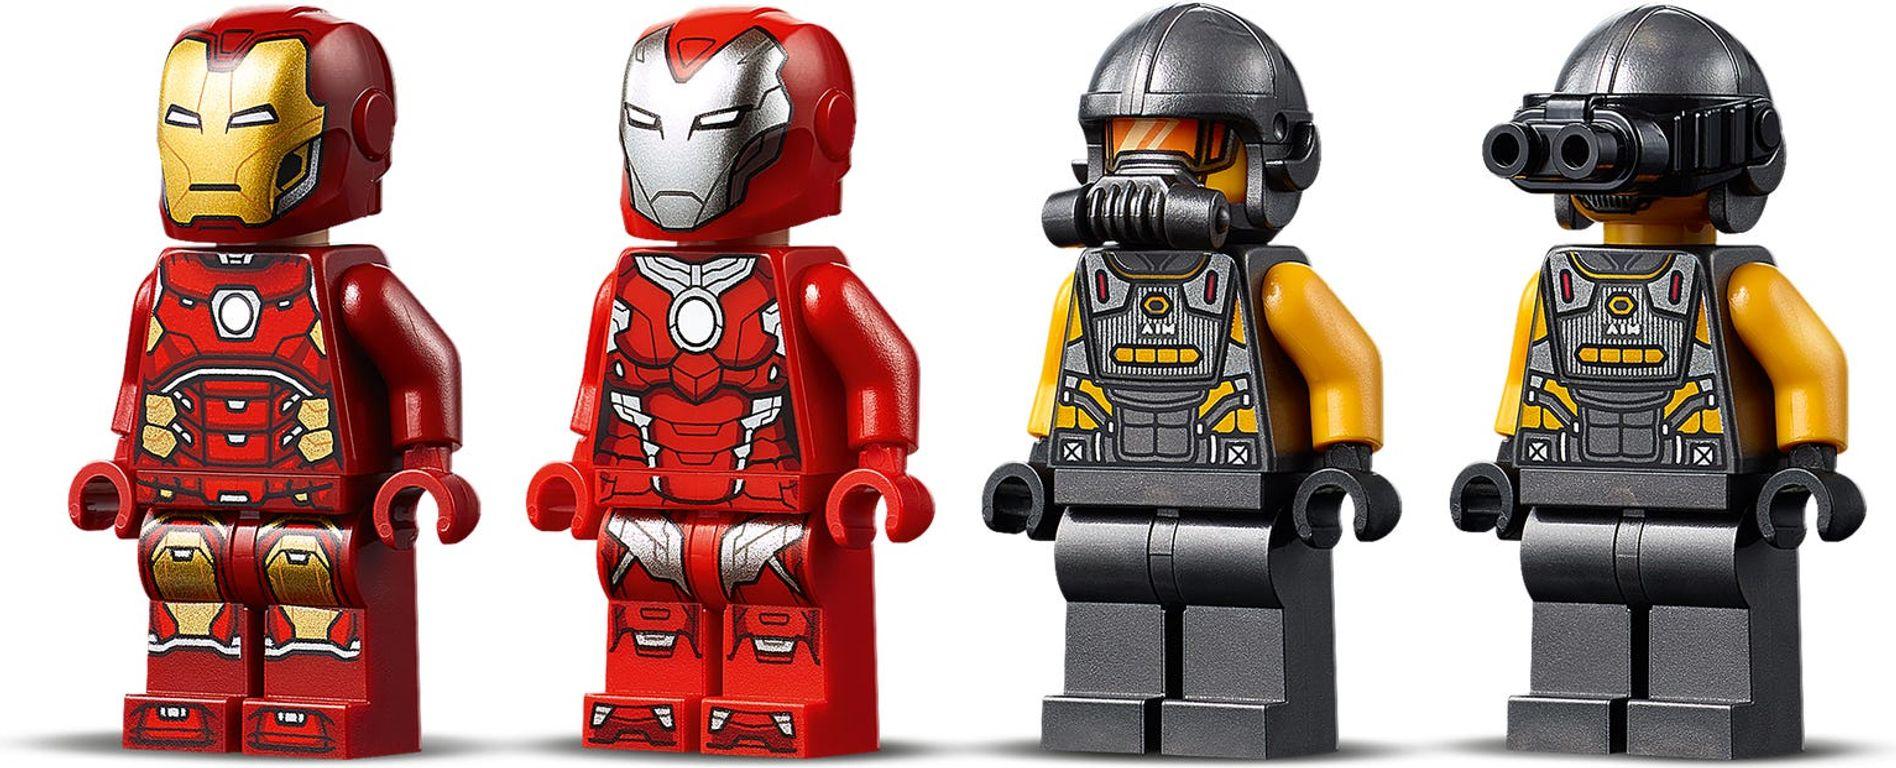 LEGO® Marvel Iron Man Hulkbuster versus A.I.M. Agent minifigures